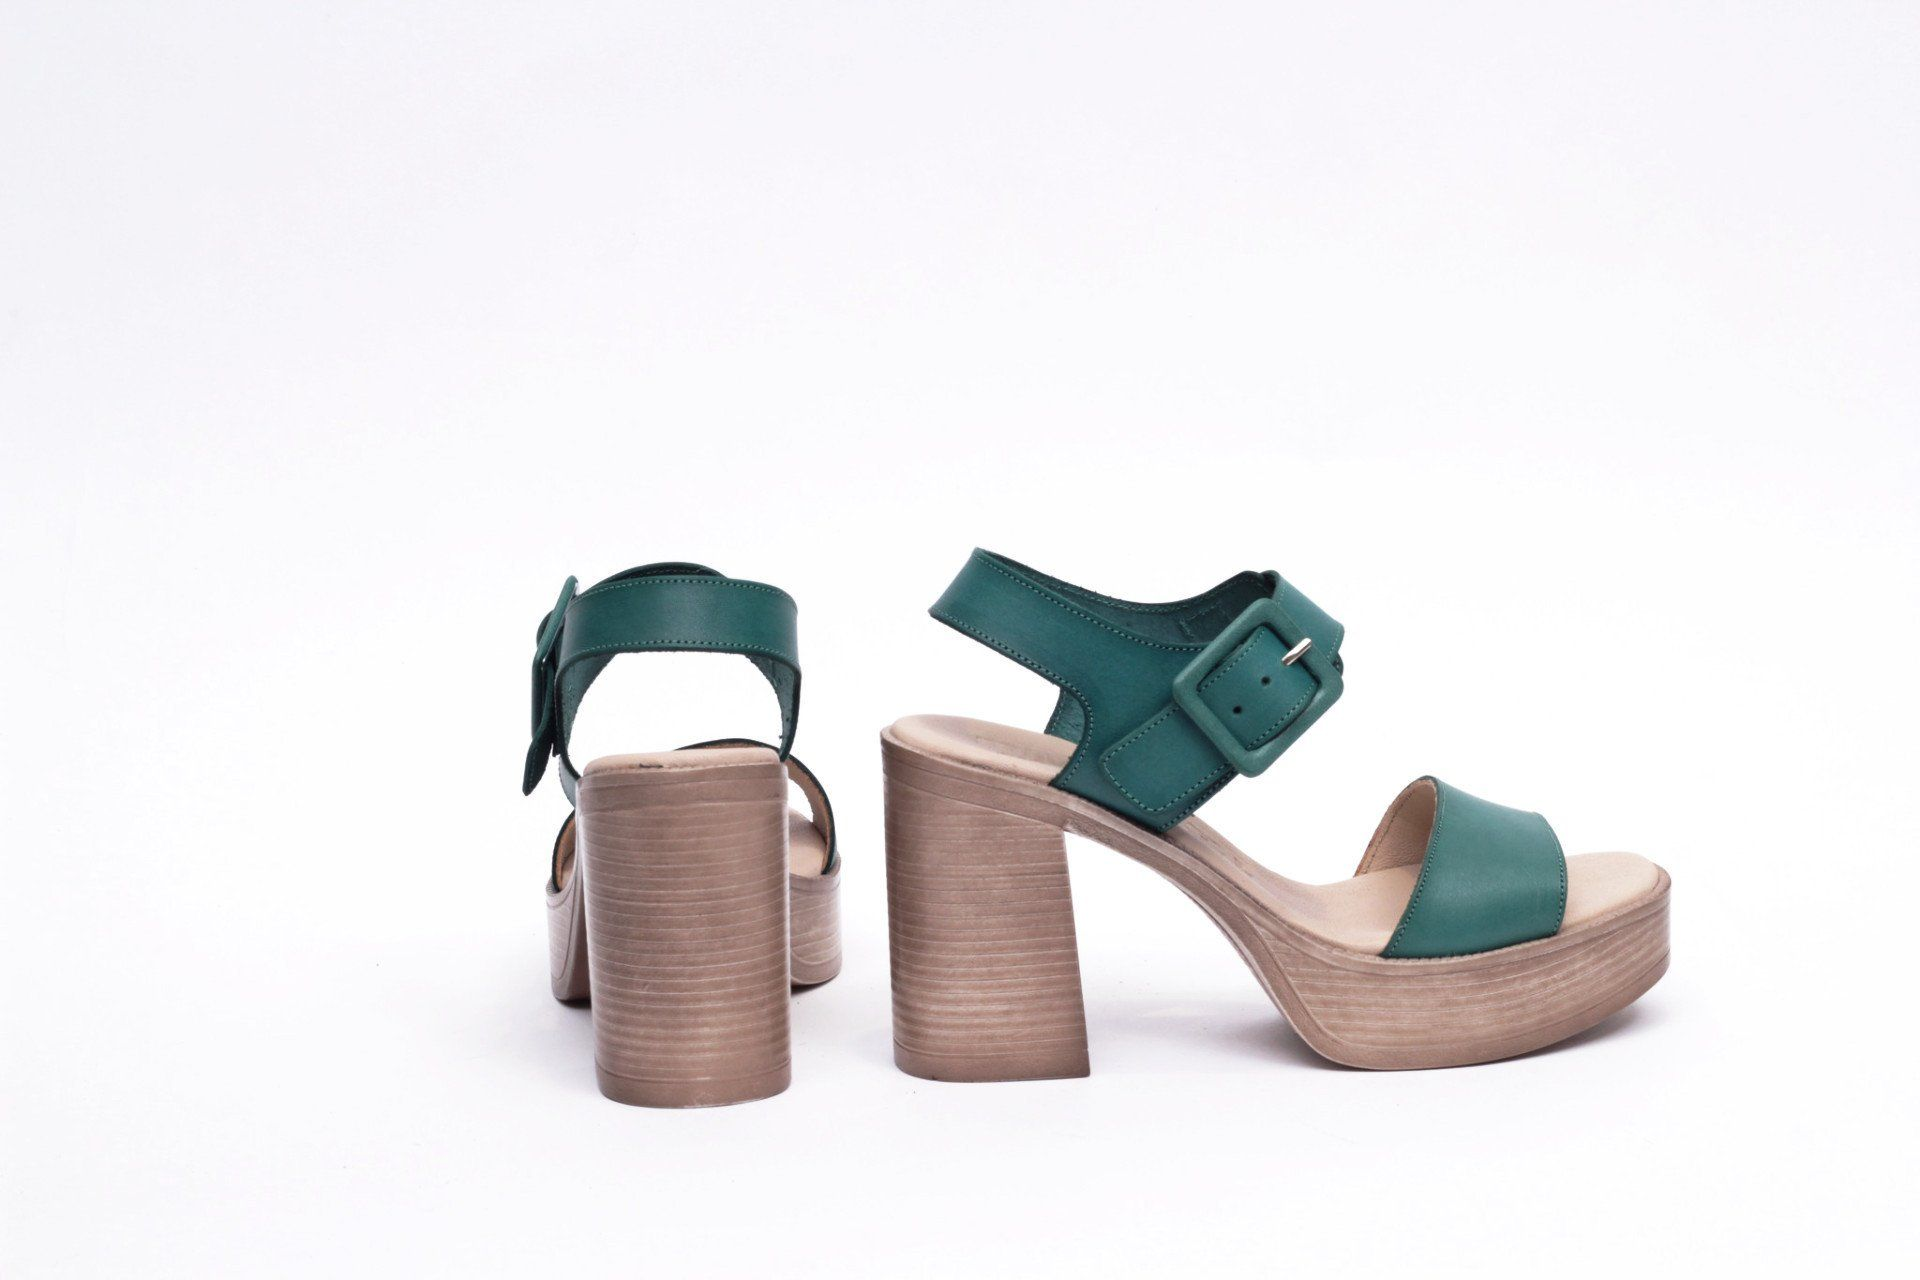 Comfort Sandalias Tacón – Cómodo Verde Plataforma Mimao Trend Mujer zqMVpSULG